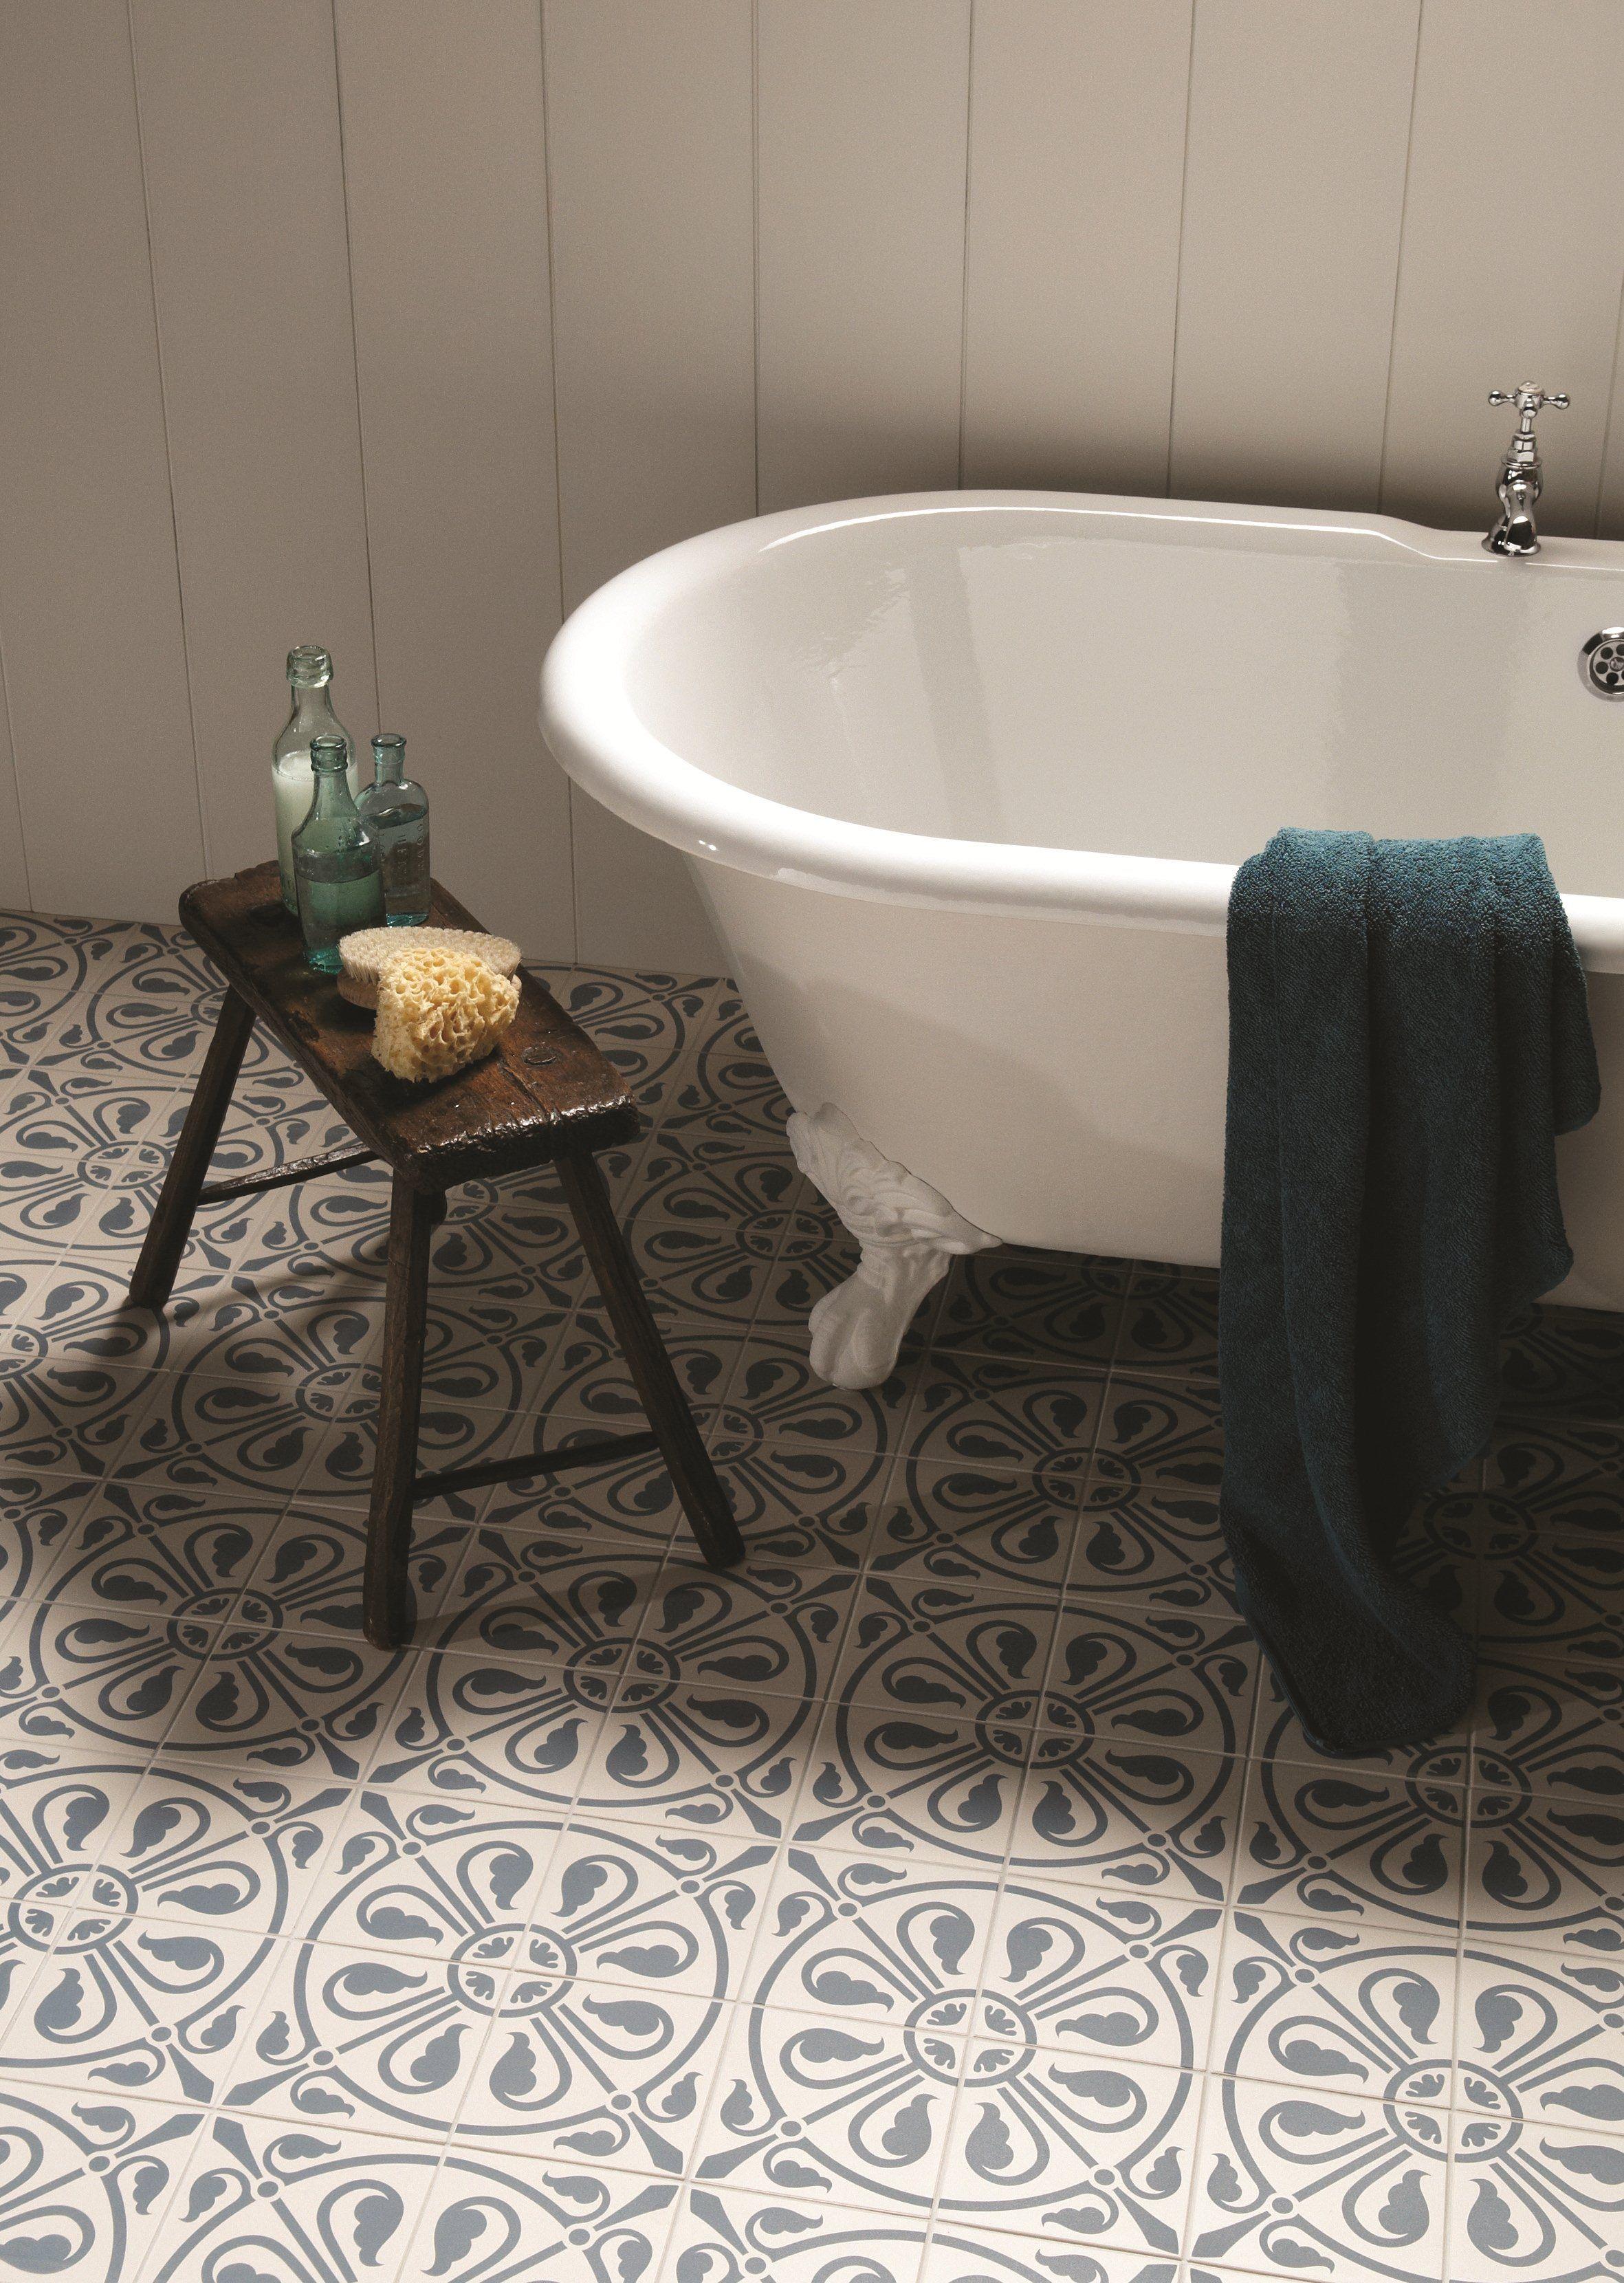 floor ceramic corner glass cabinets ideas retro java bath shower vintage sliced pebble brown patterns tan bathroom tile